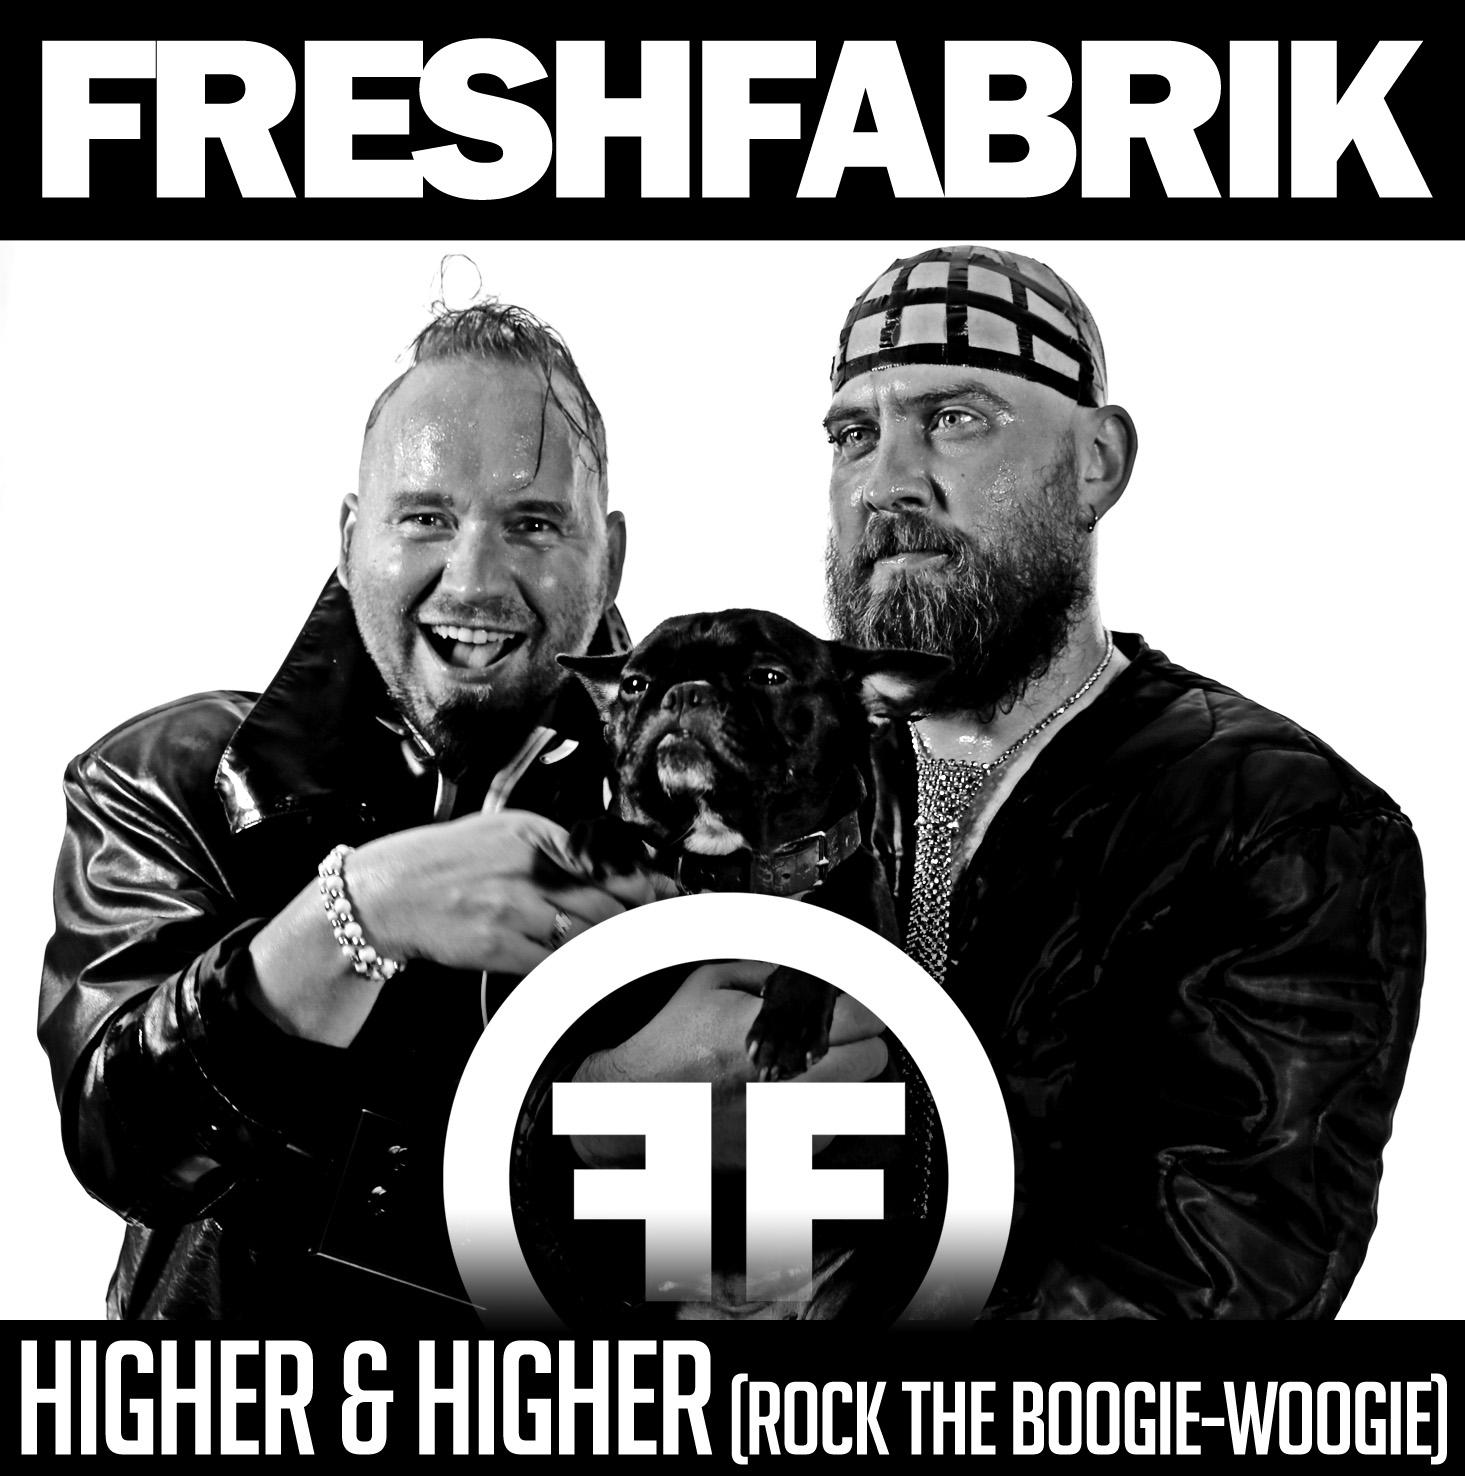 ff-higher&higher-CD-front.jpg